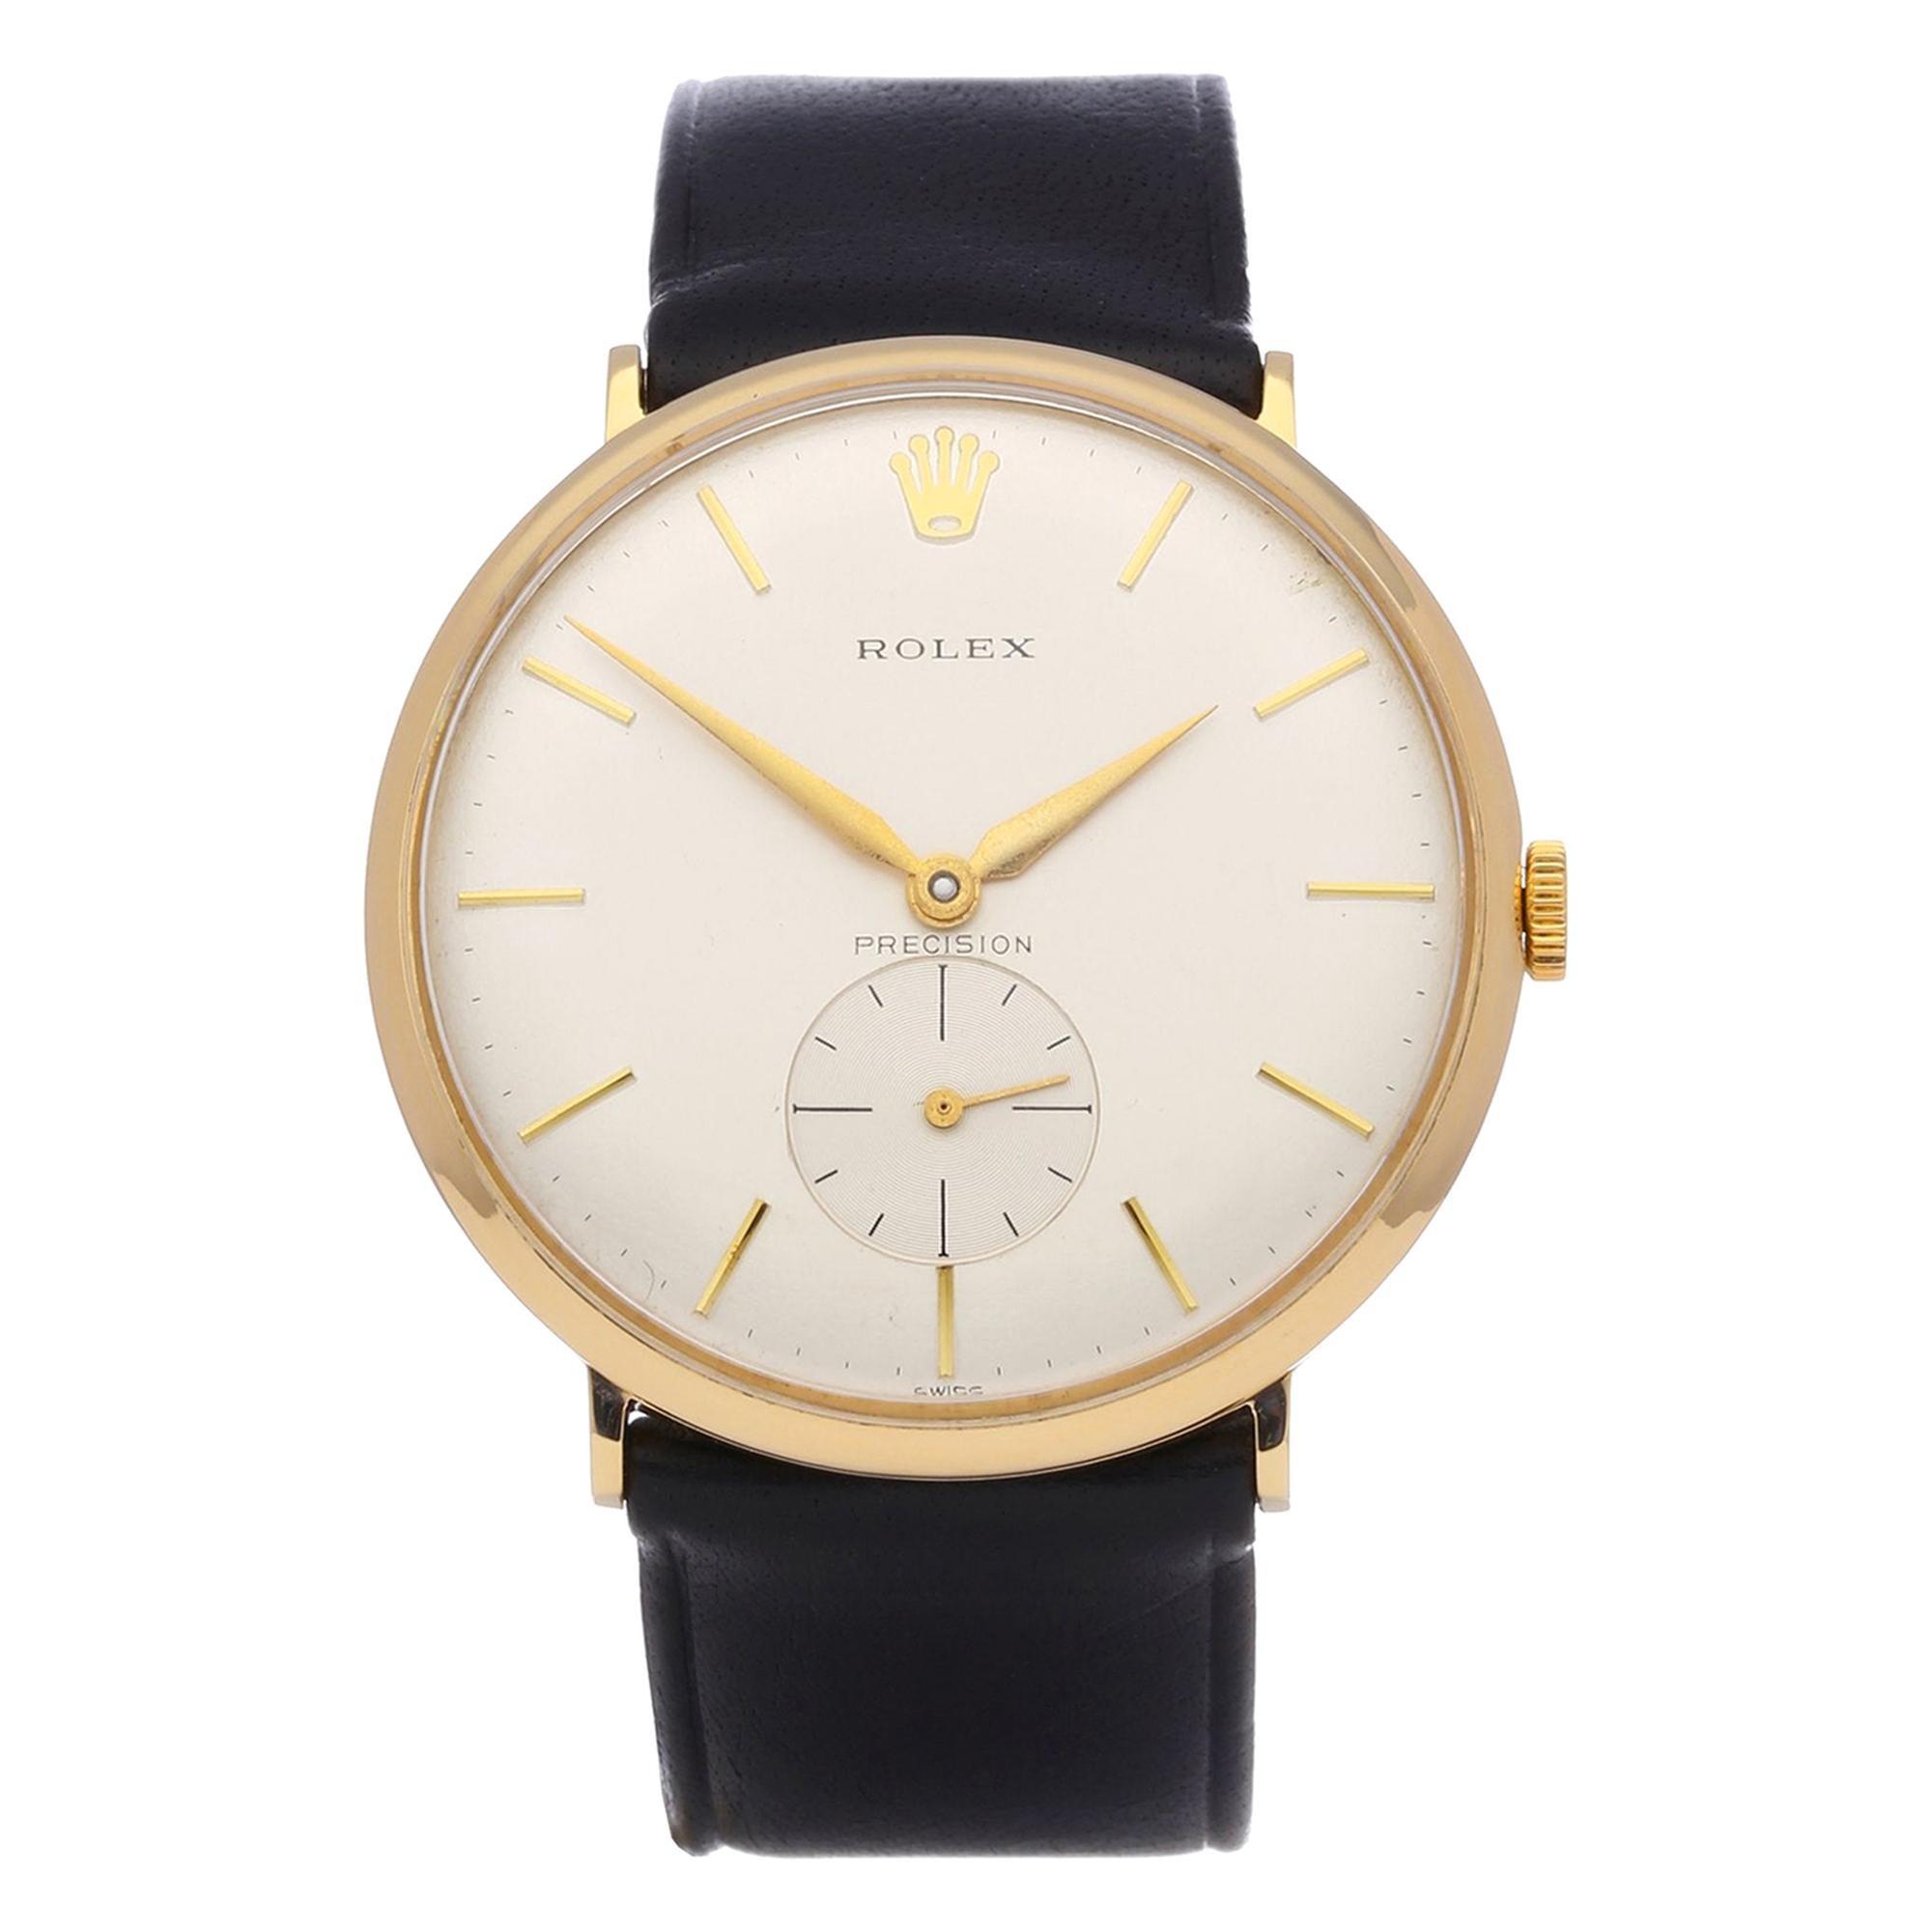 Rolex Precision 1200 Men's Yellow Gold Watch